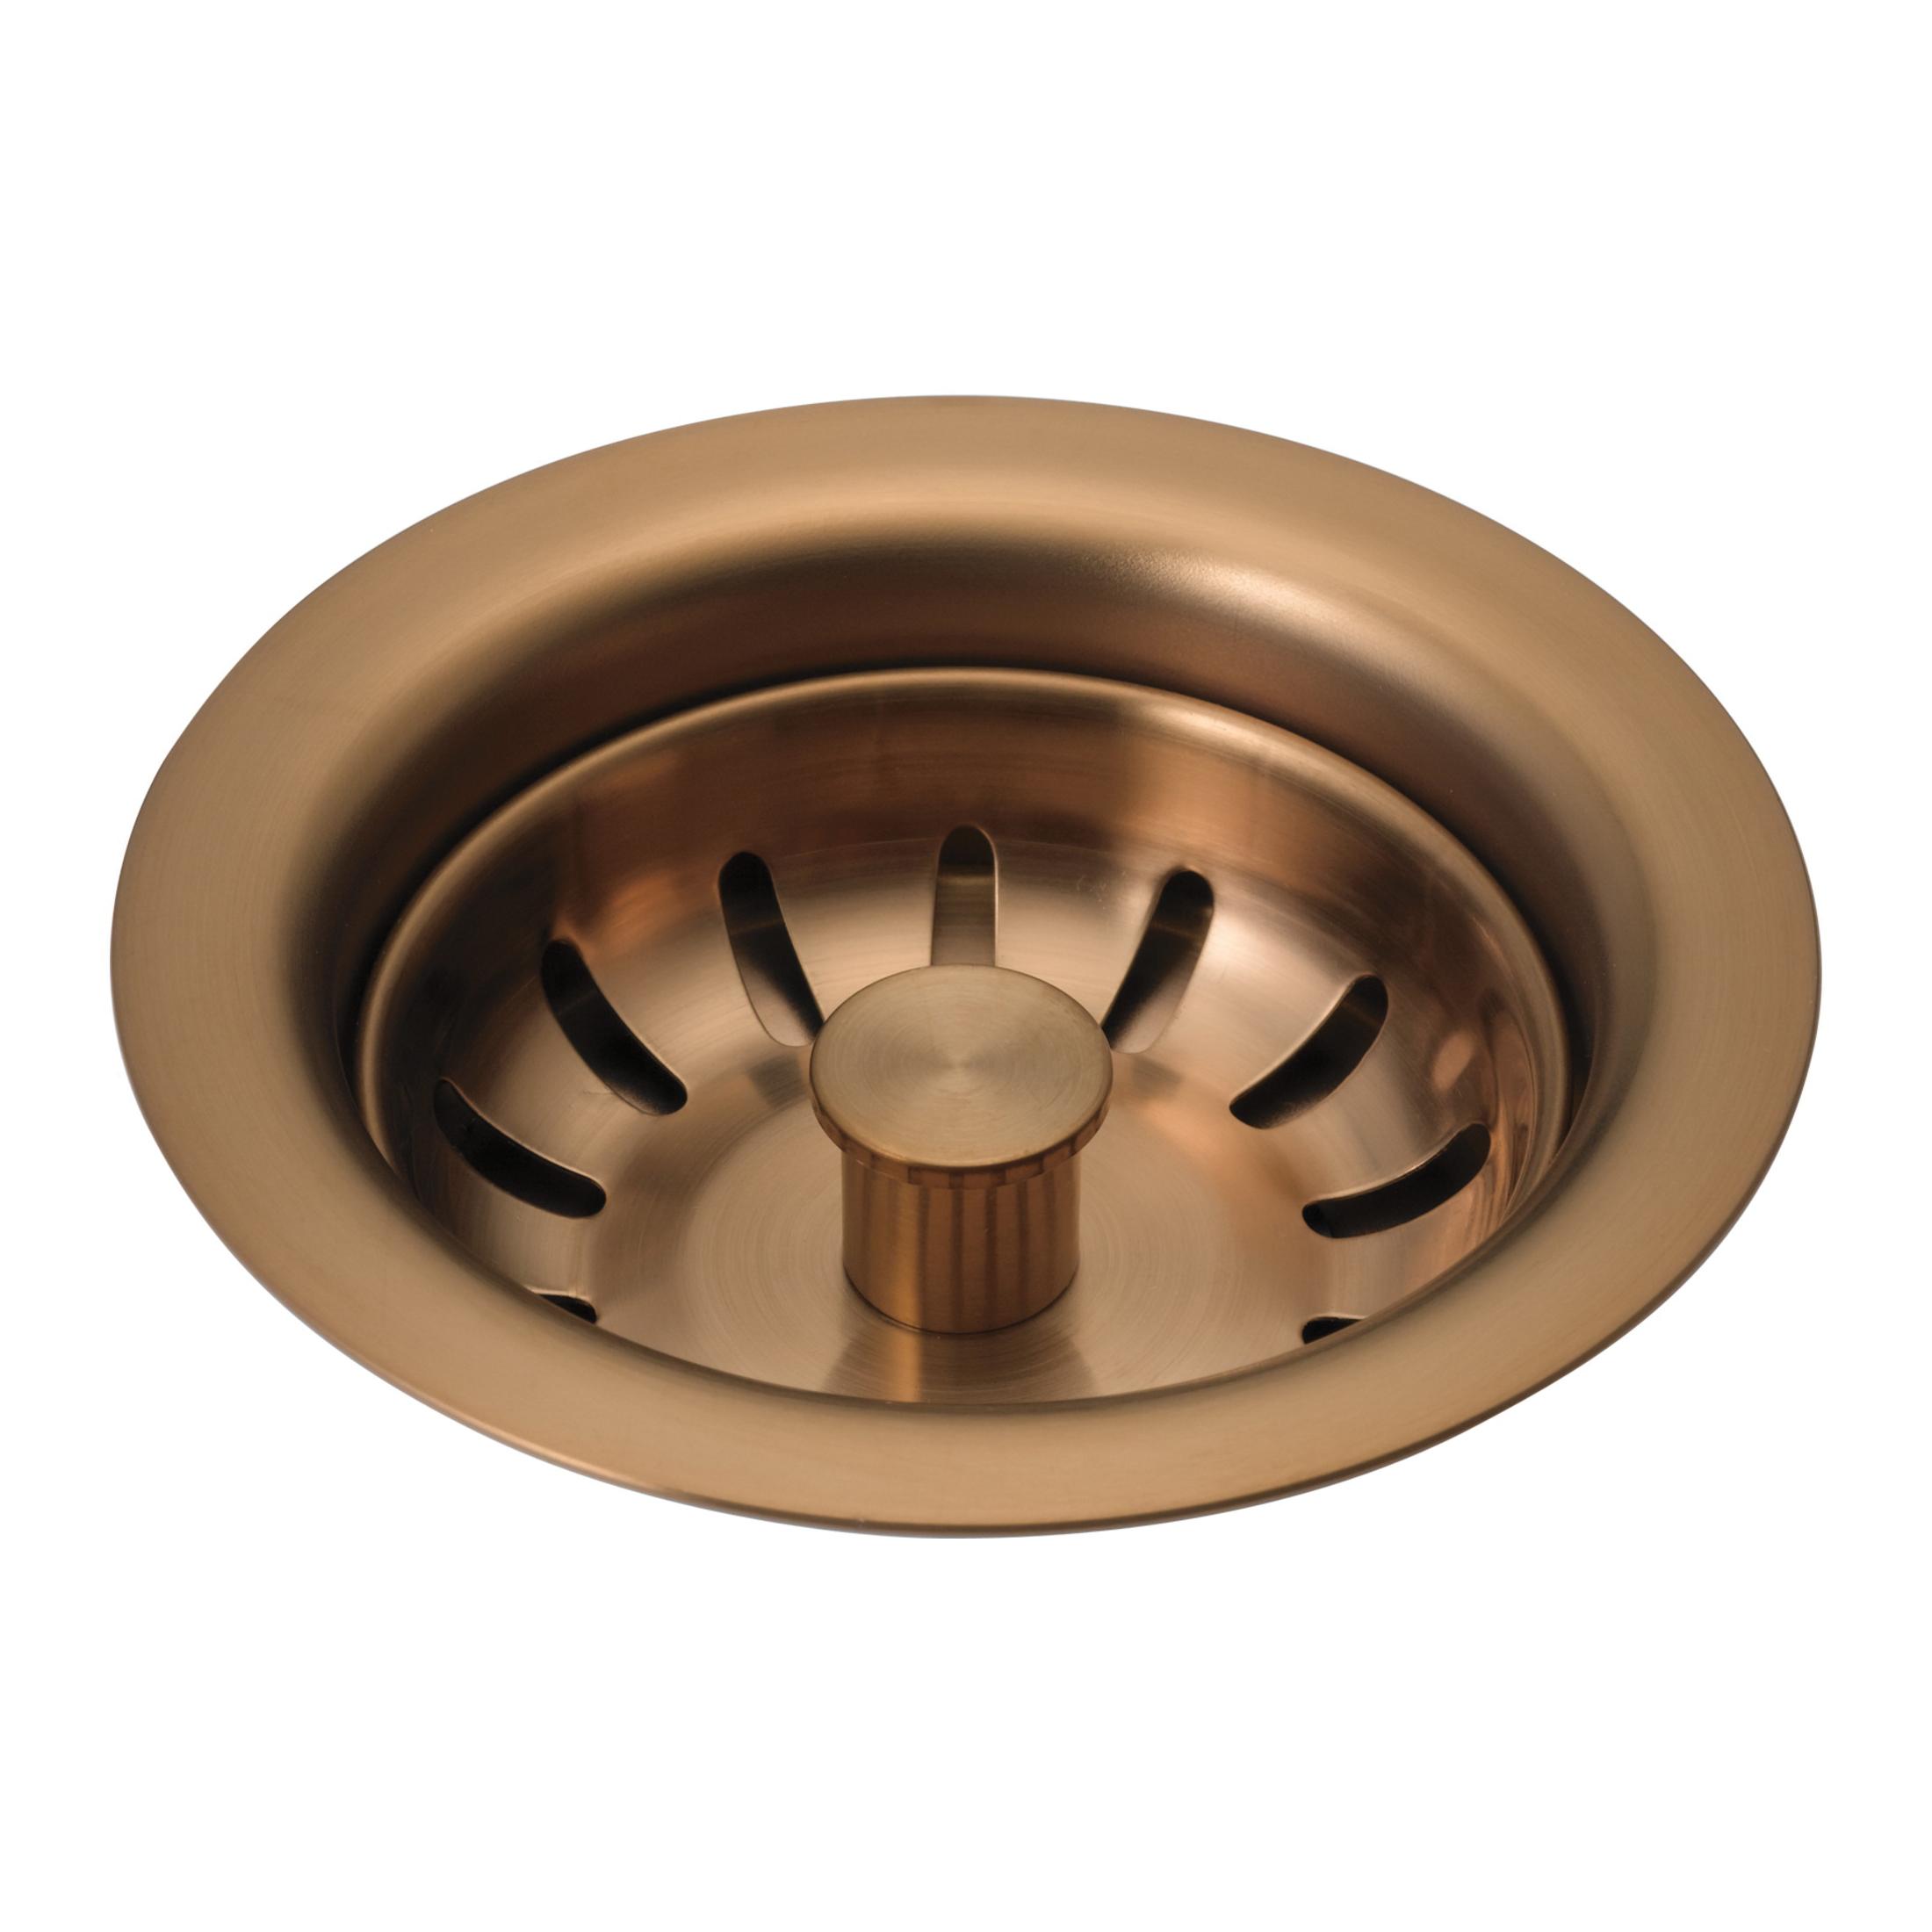 Brizo® 69050-BZ Flange and Strainer, 1-1/2 x 11-1/2 in Nominal, NPSM, Brass, Brilliance® Brushed Bronze, Import